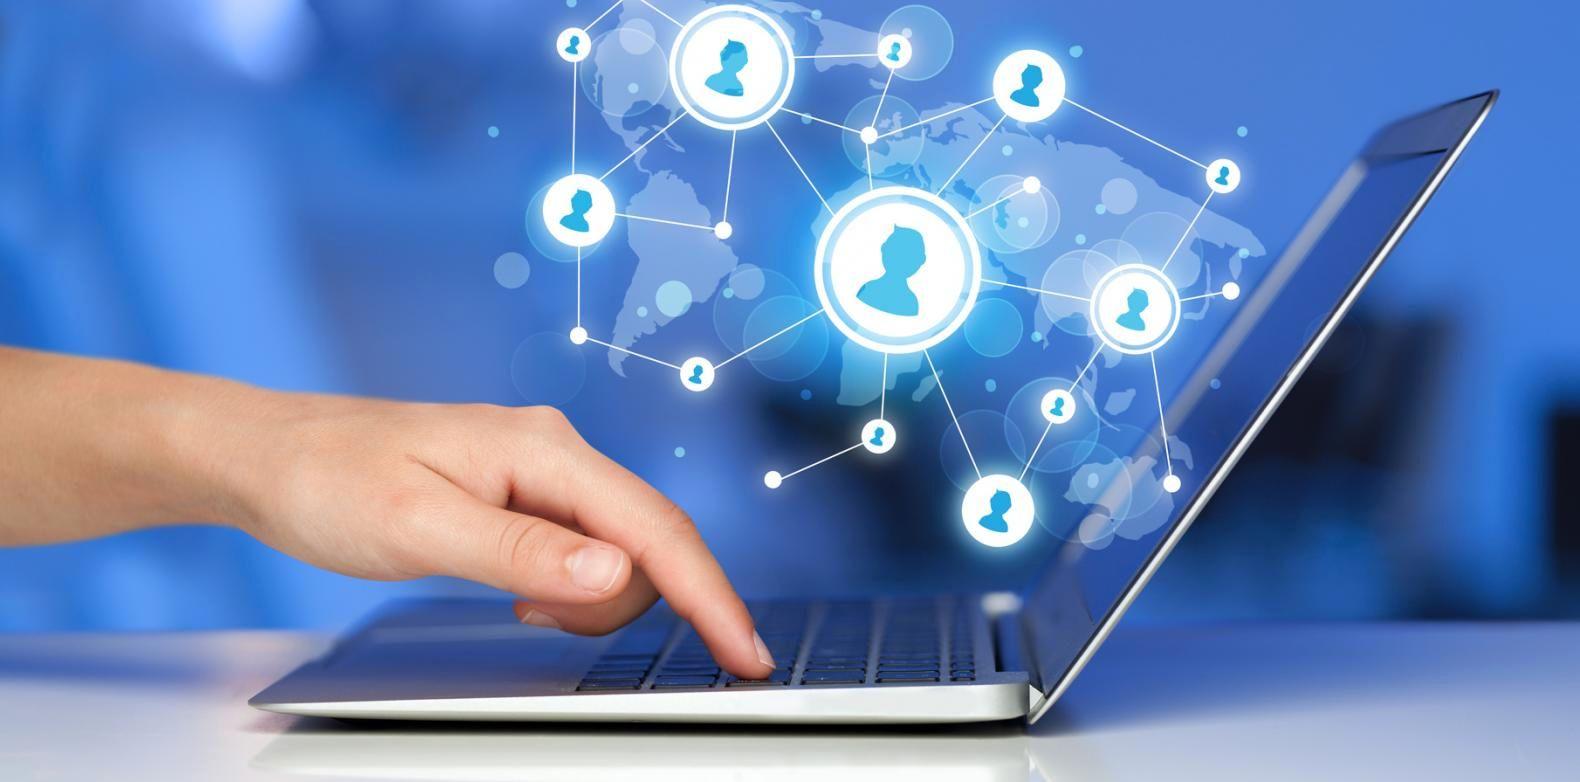 اهیمت آنلاین کردن کسب و کار